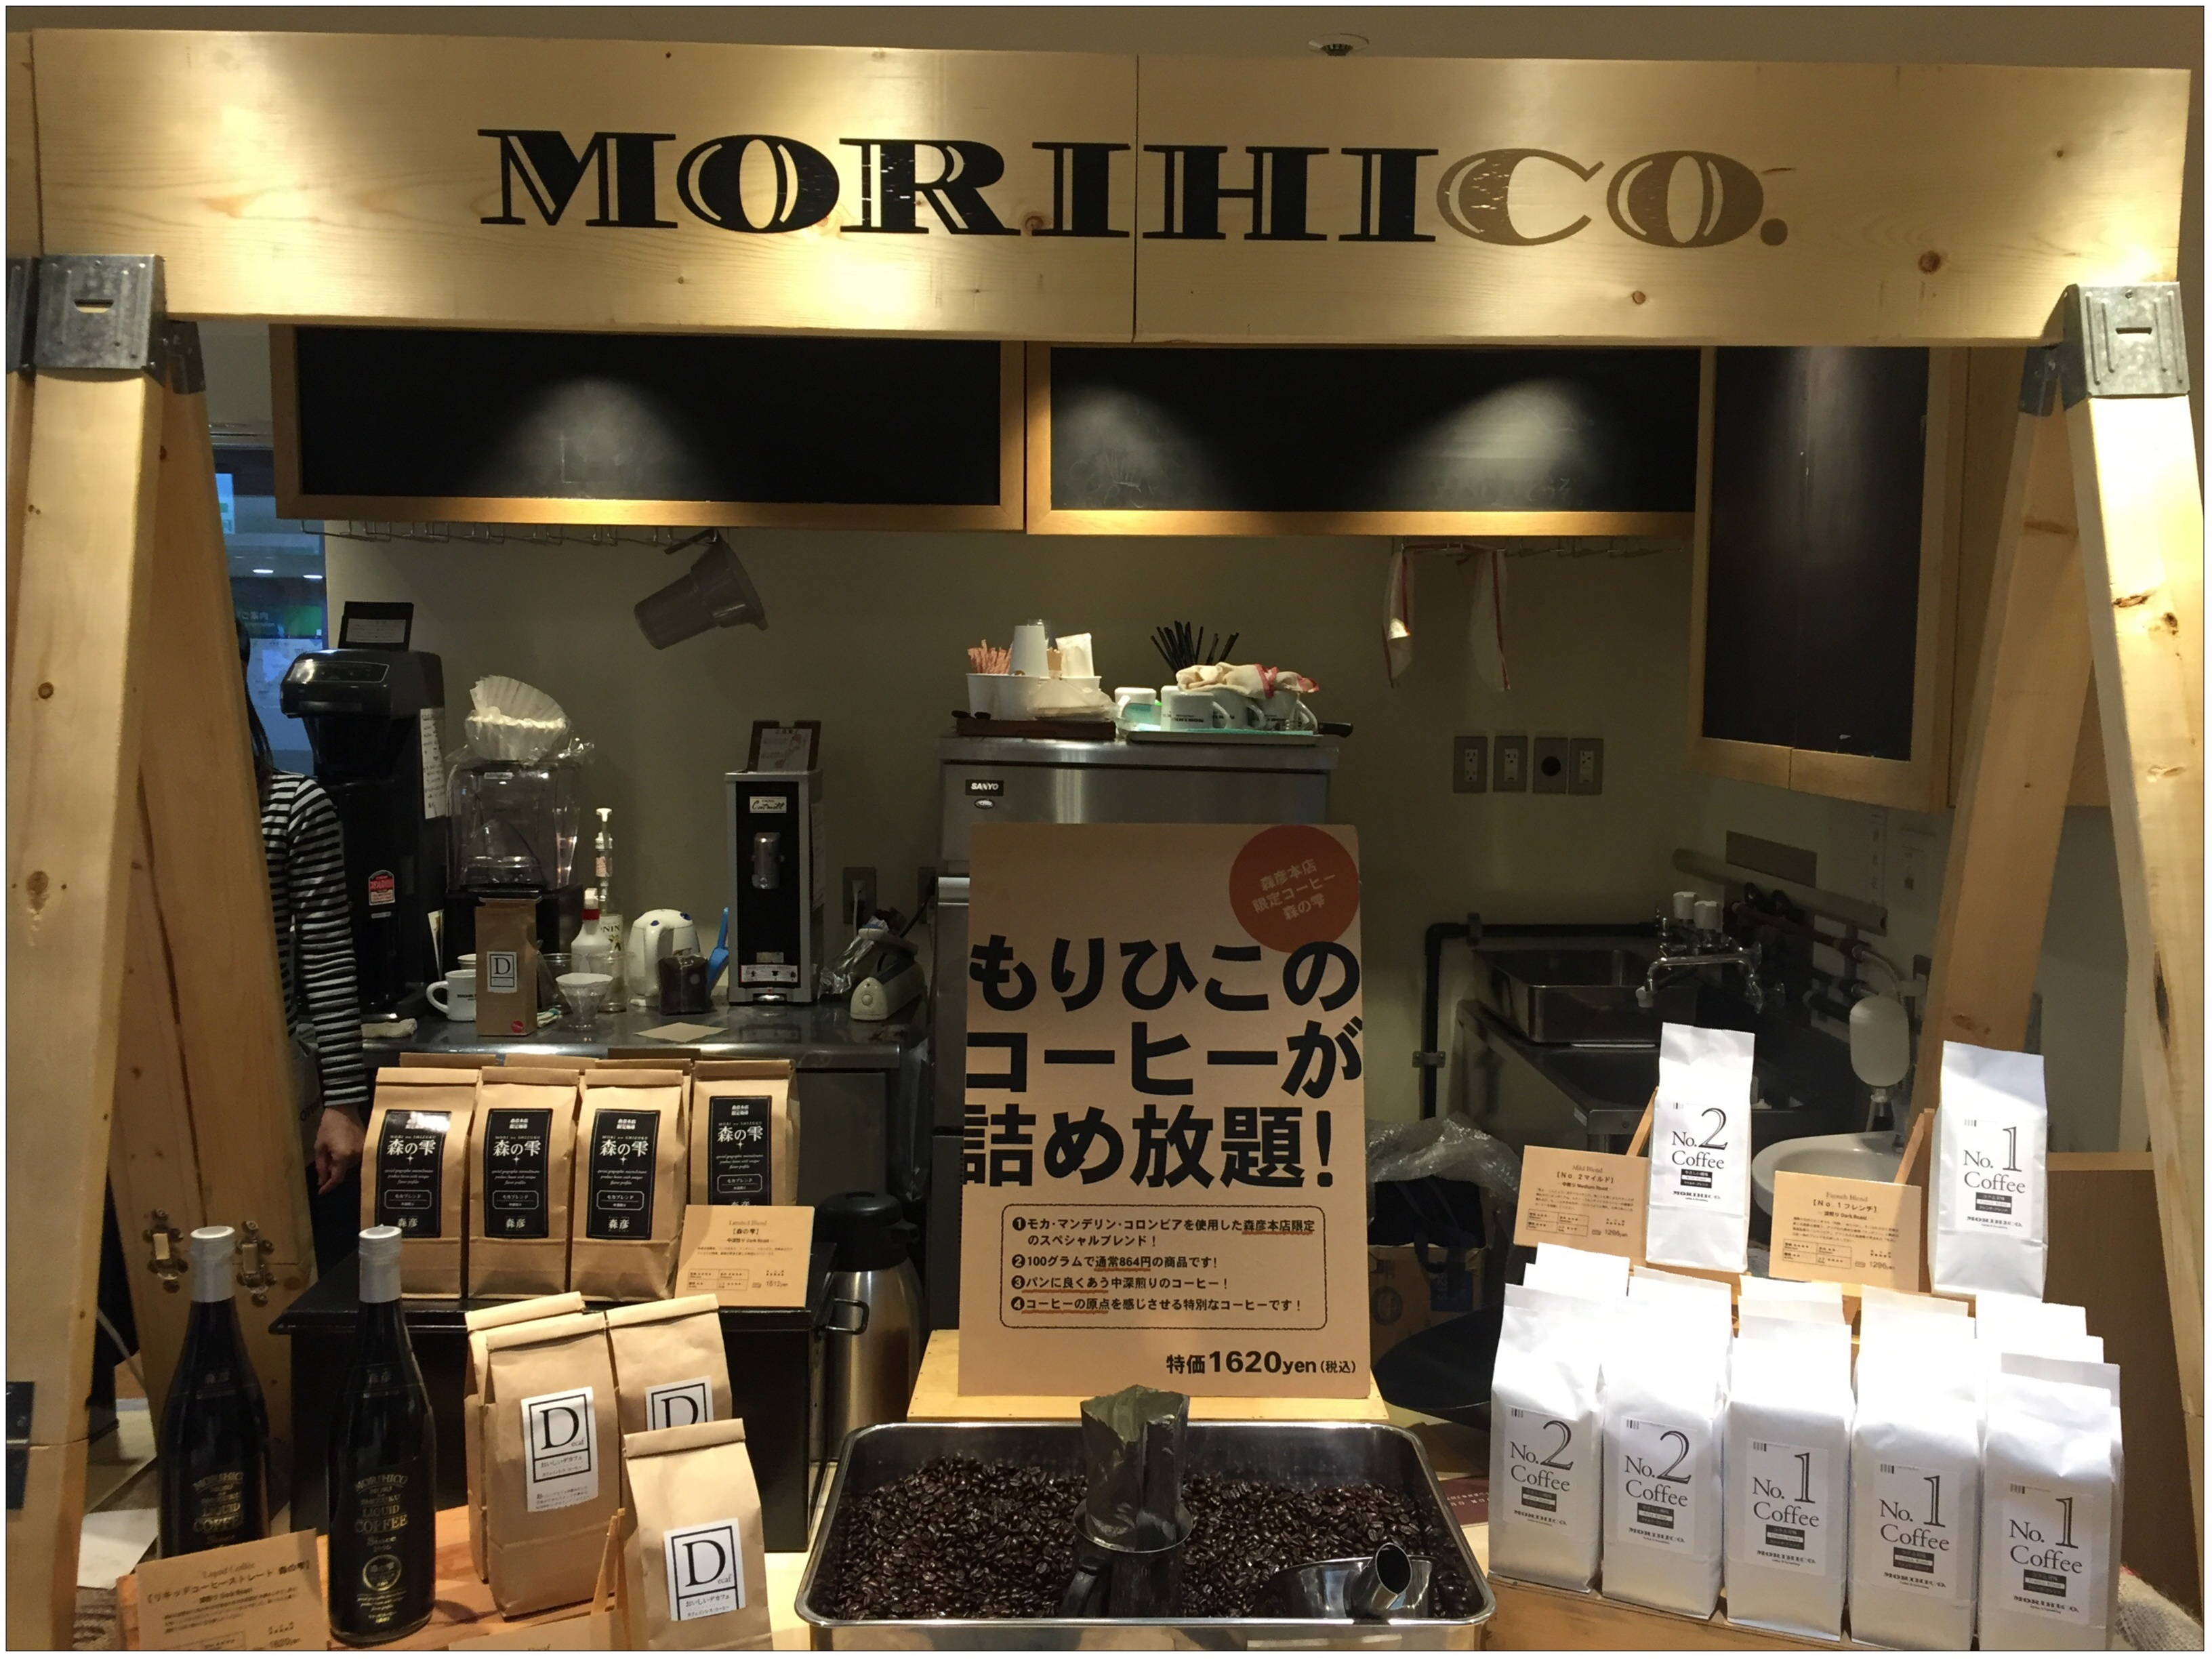 …ஐ コーヒー好きさんは急いで!札幌にしか出店していない【MORIHICO COFFEE & SOMETHING】が期間限定で東京にオープン♥️ஐ¨_3